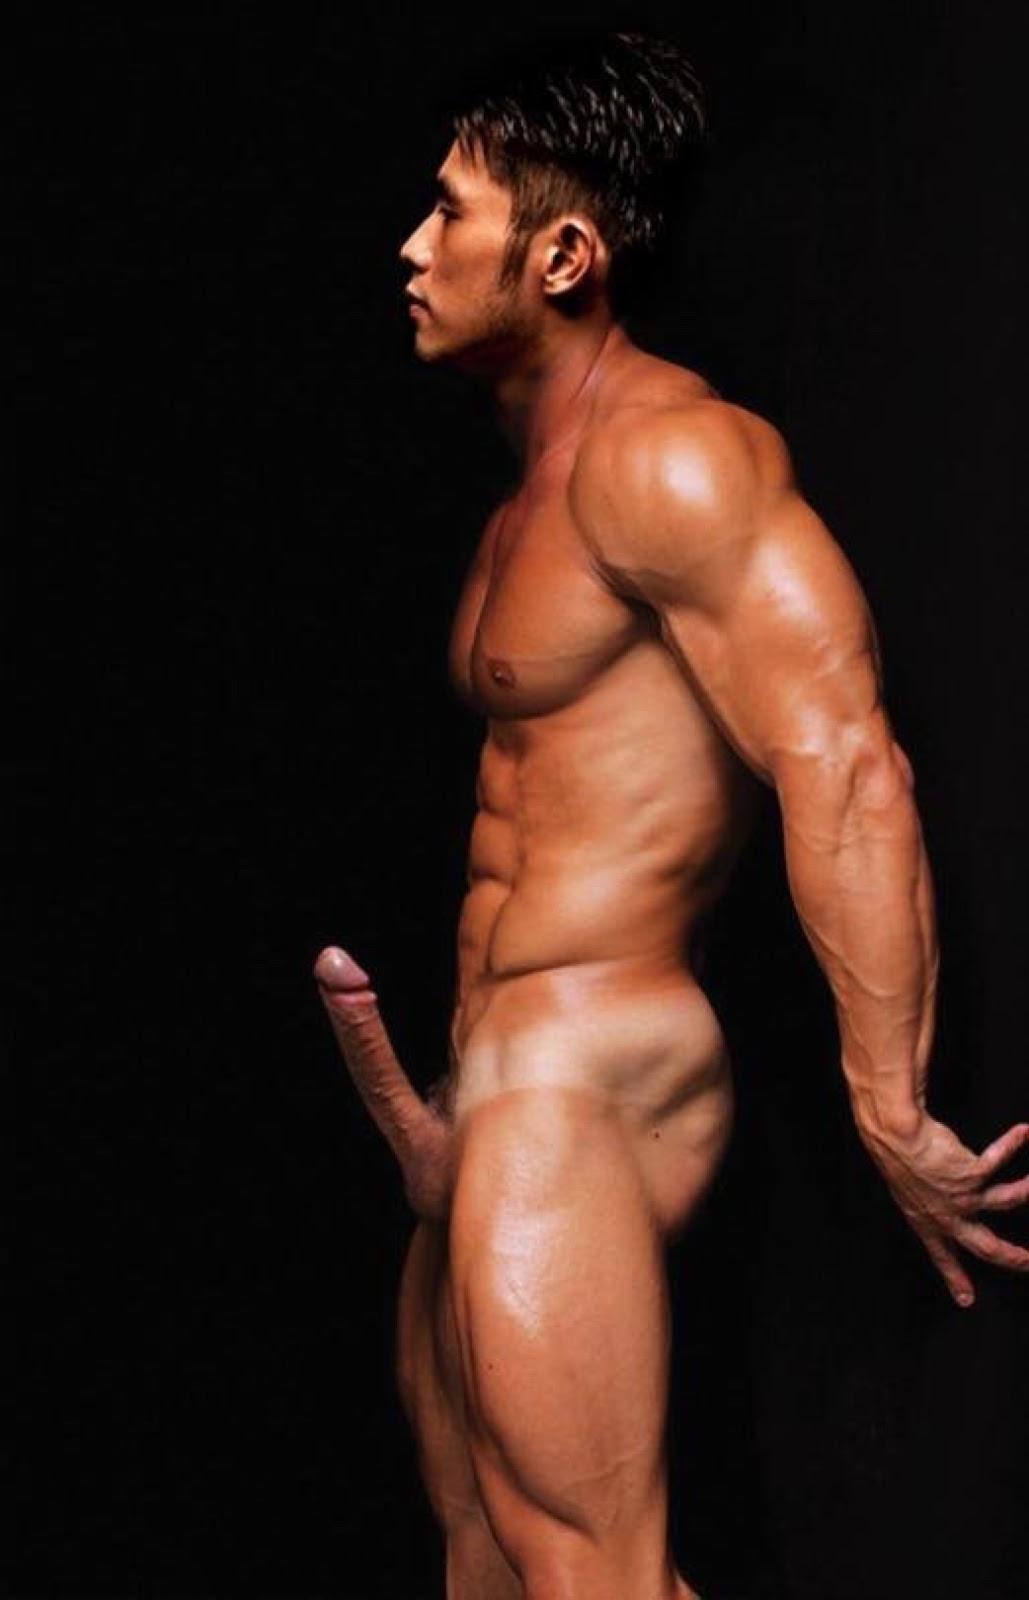 Nude male stripper cfnm erection